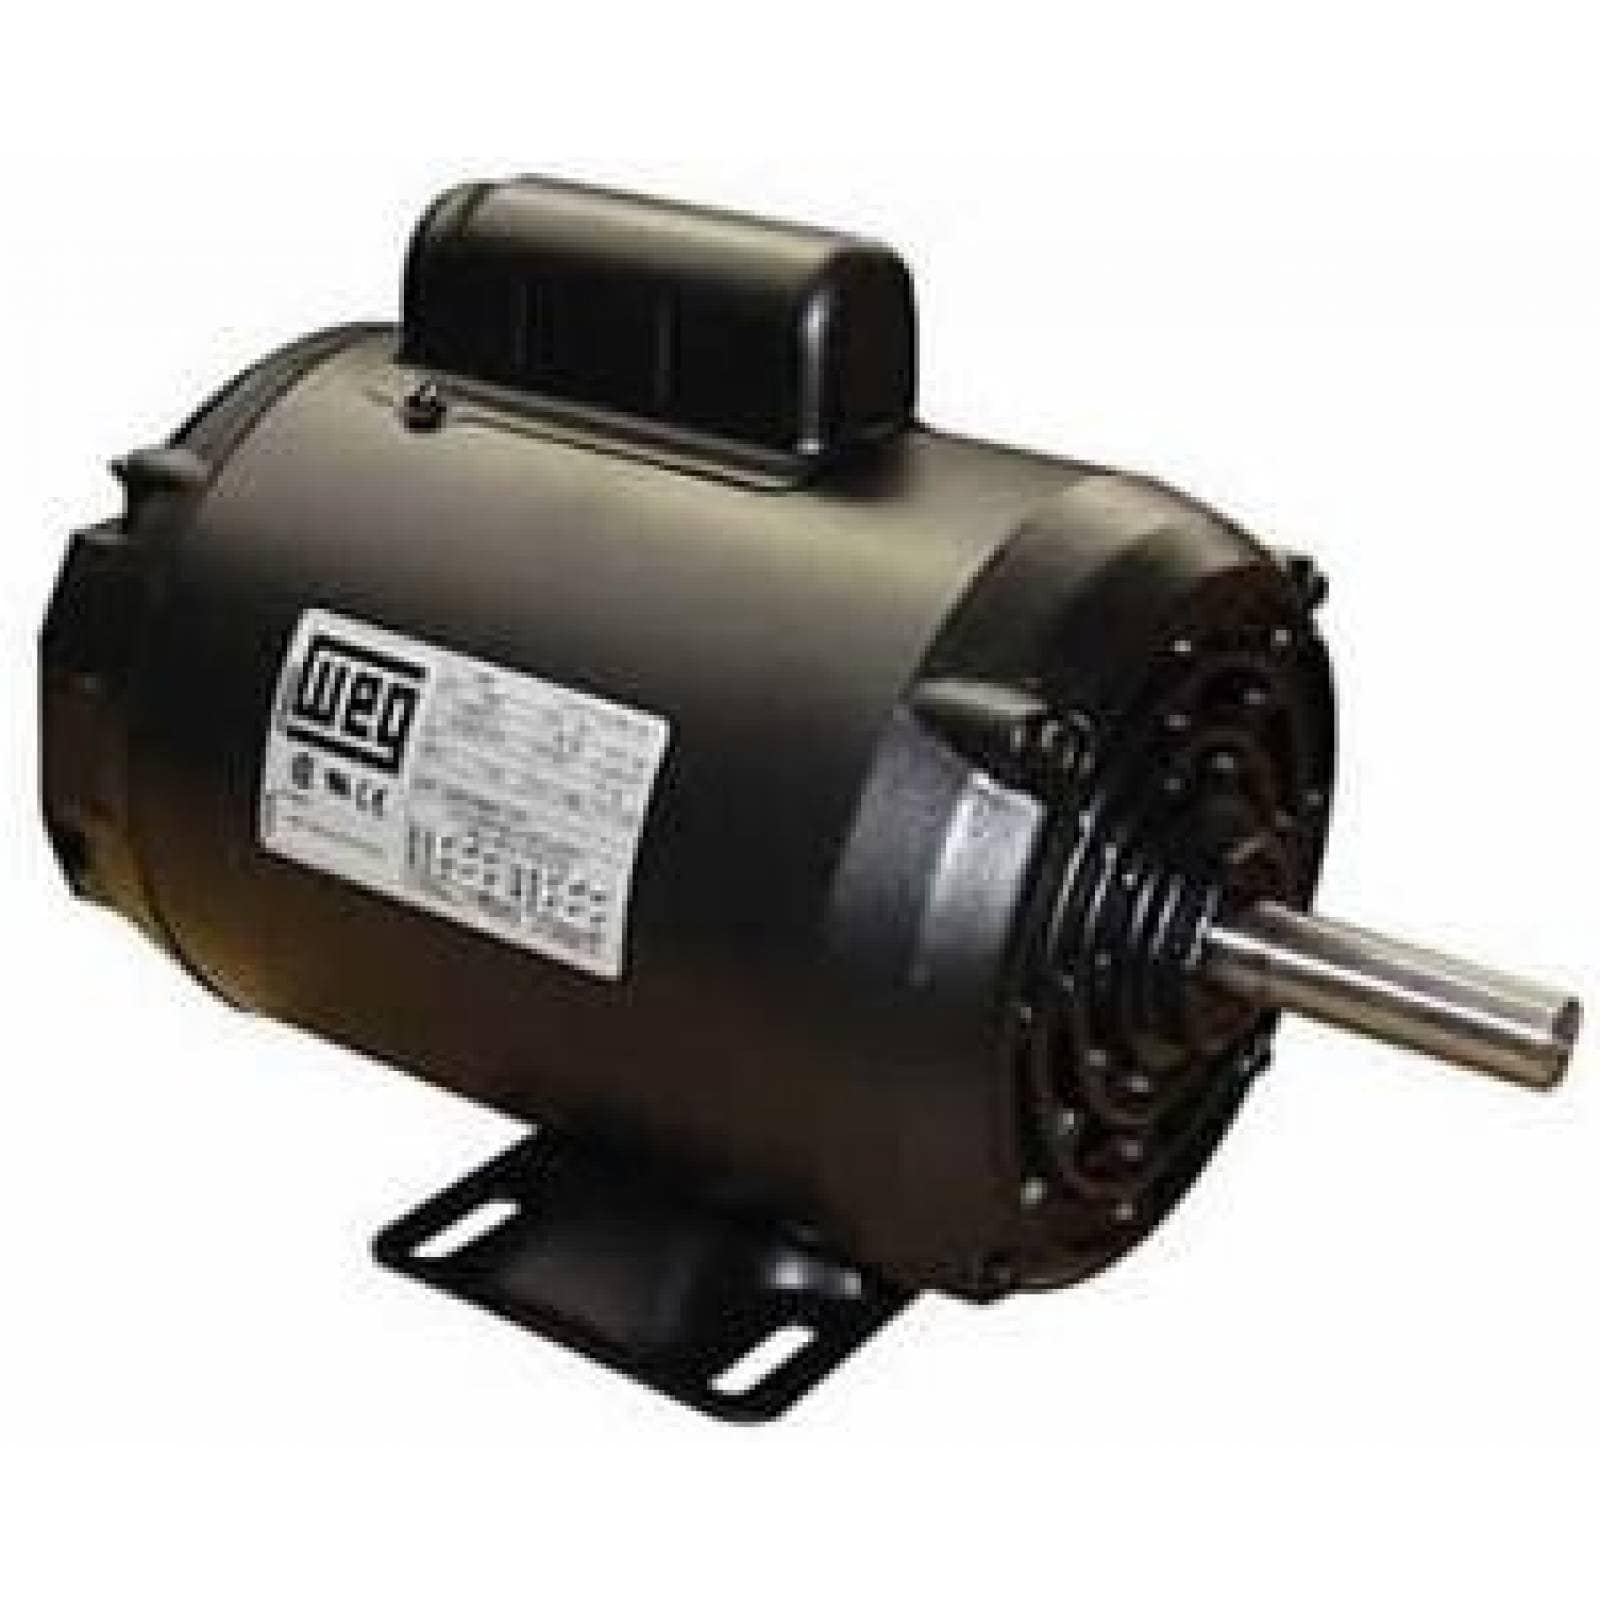 Motor Para Bomba Baja 1/2 127/220 Negro Weg